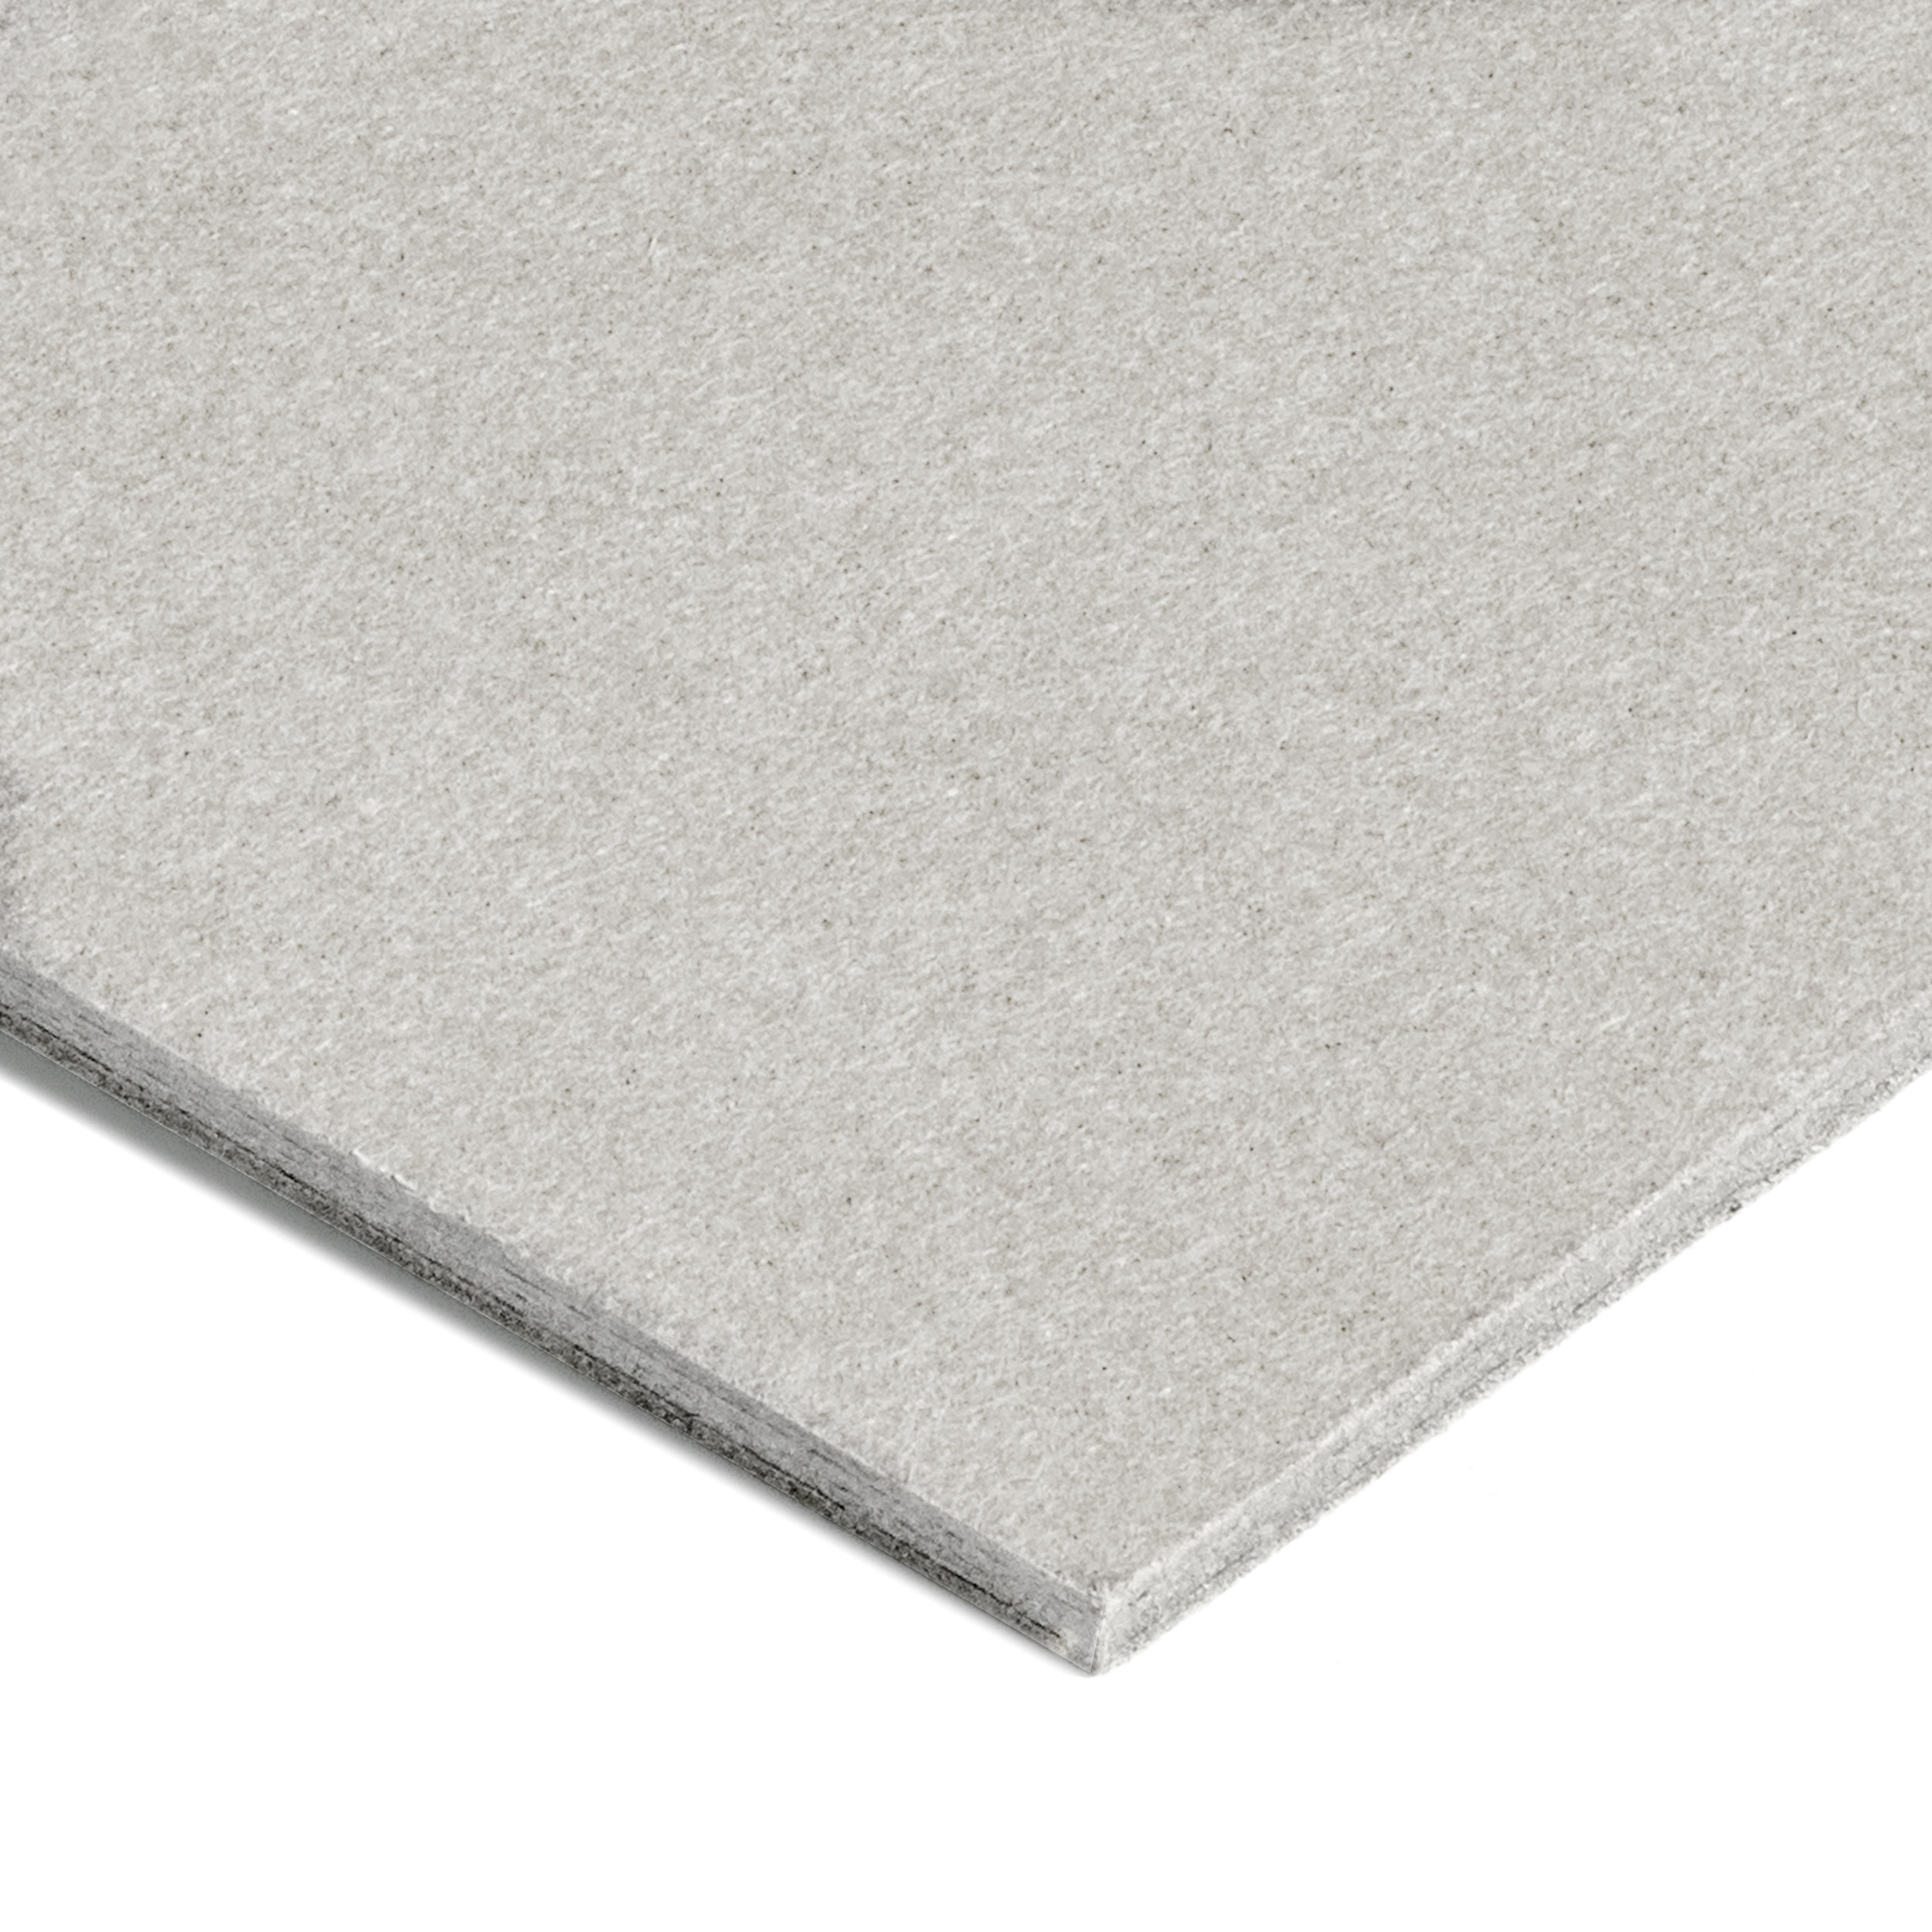 Medium Grey (4ply)